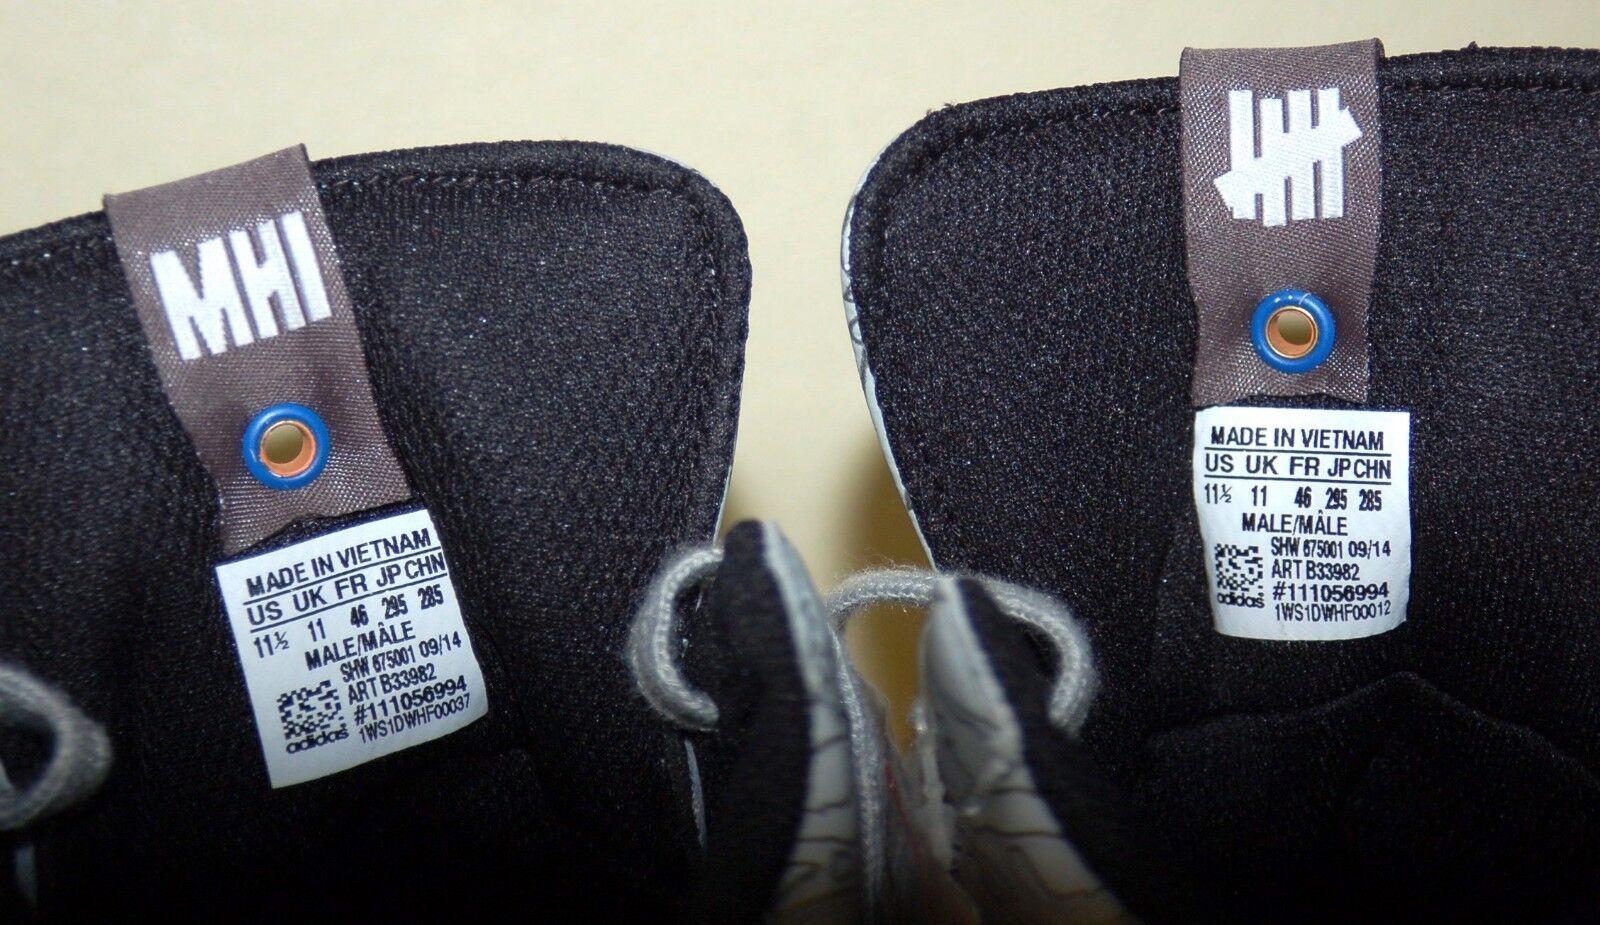 Adidas X Men's Jabbar Mid Undefeated X MHI, B33982, Black/White, US Size 11.5